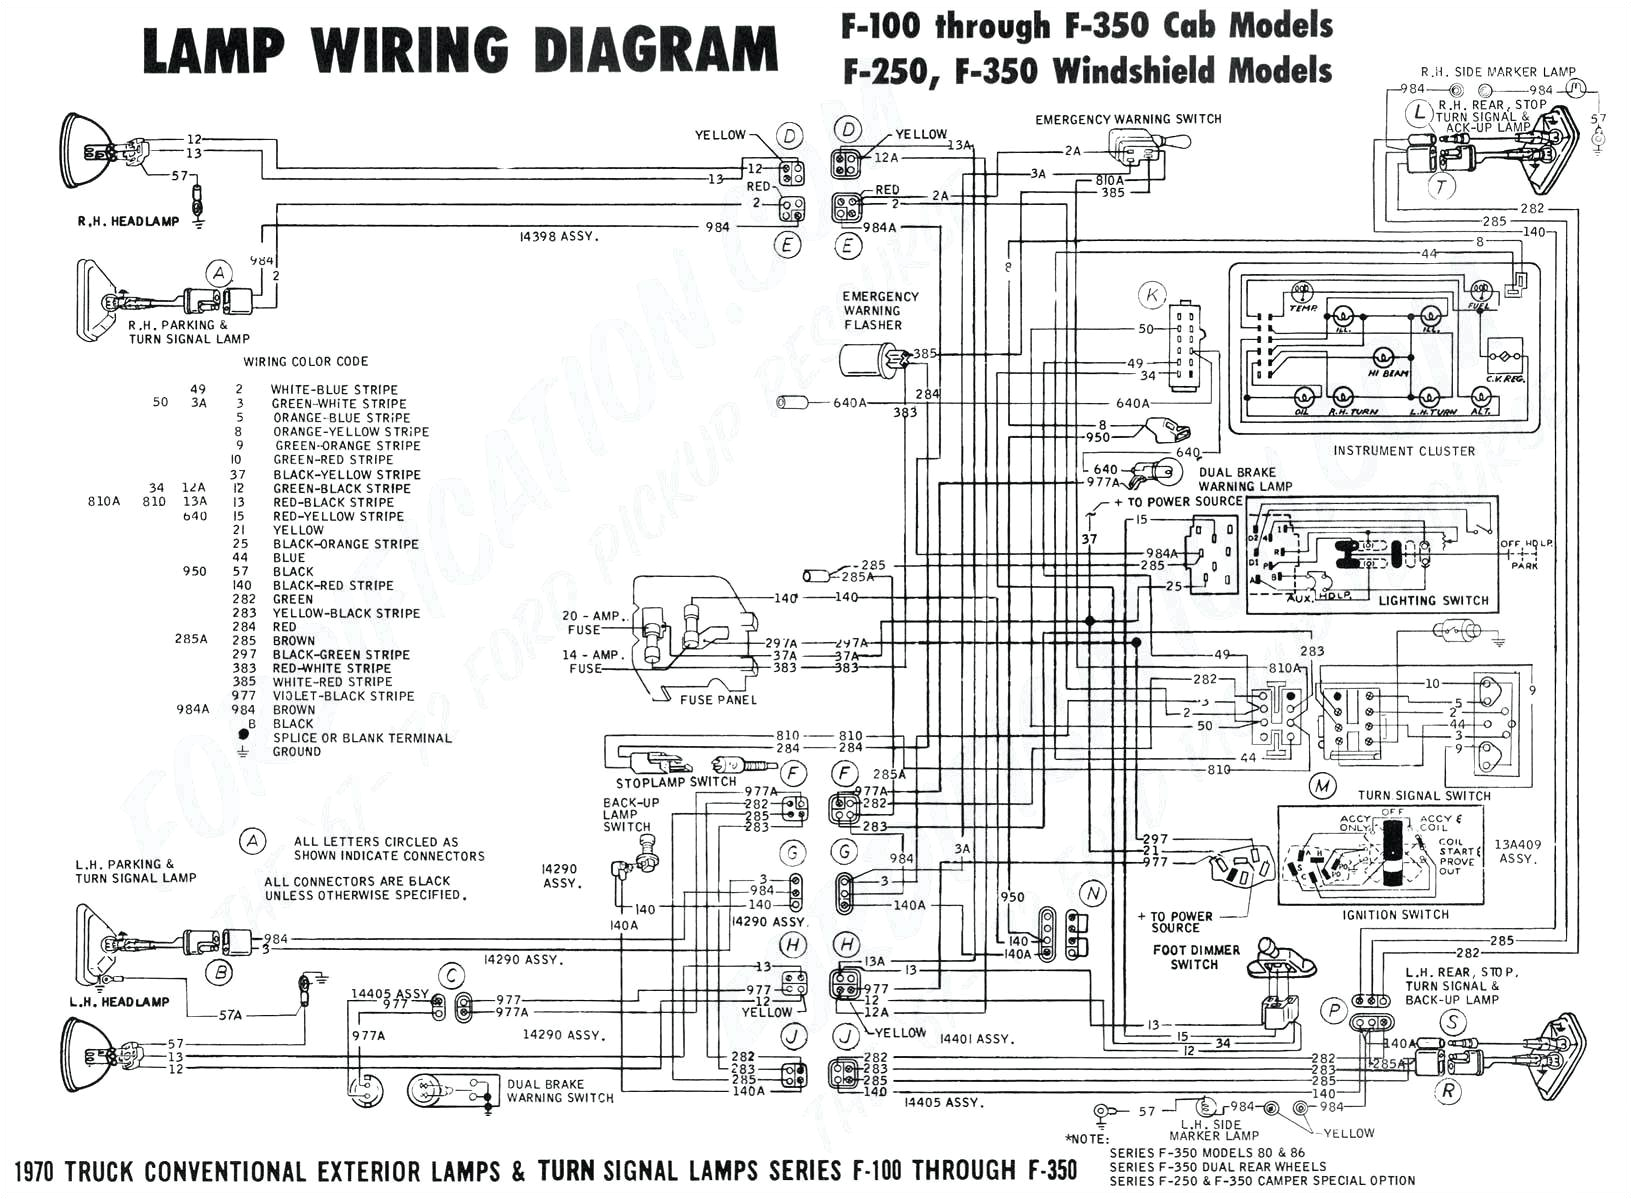 2005 ford f150 trailer wiring diagram free wiring diagram jpg